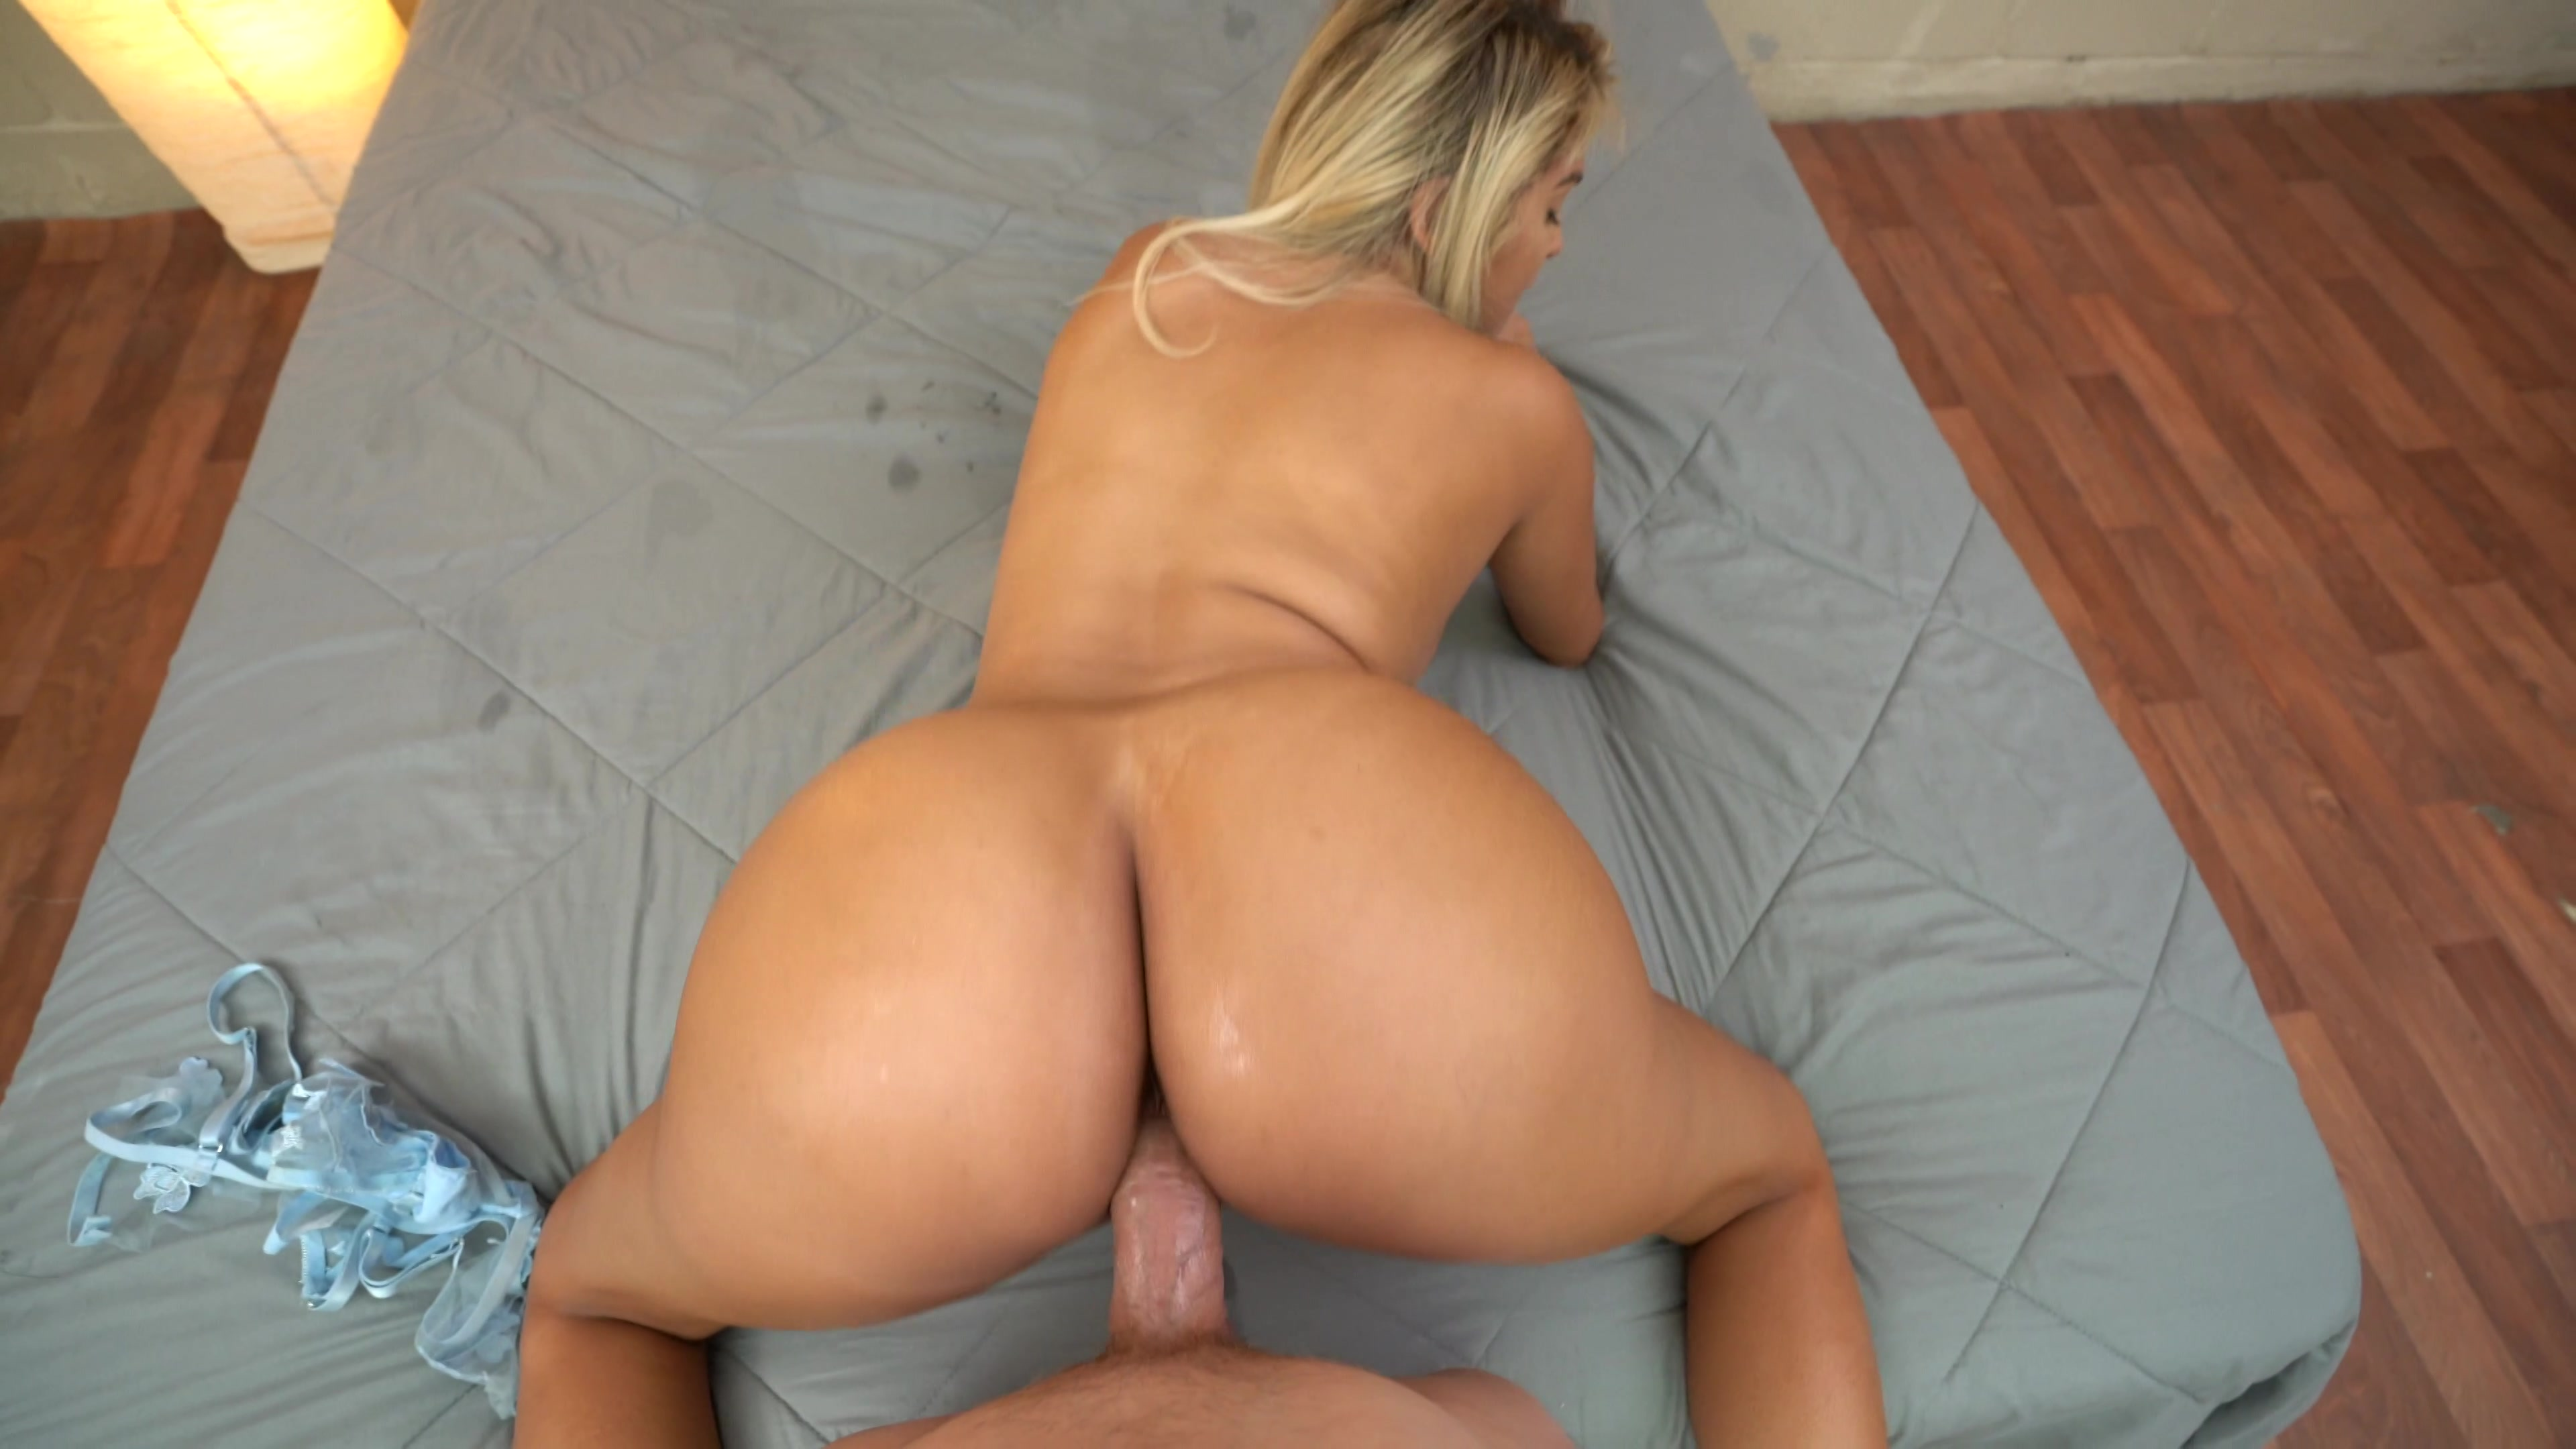 Curvy Latina Beauty Stephanie West Pov Big Cock Sex -1373